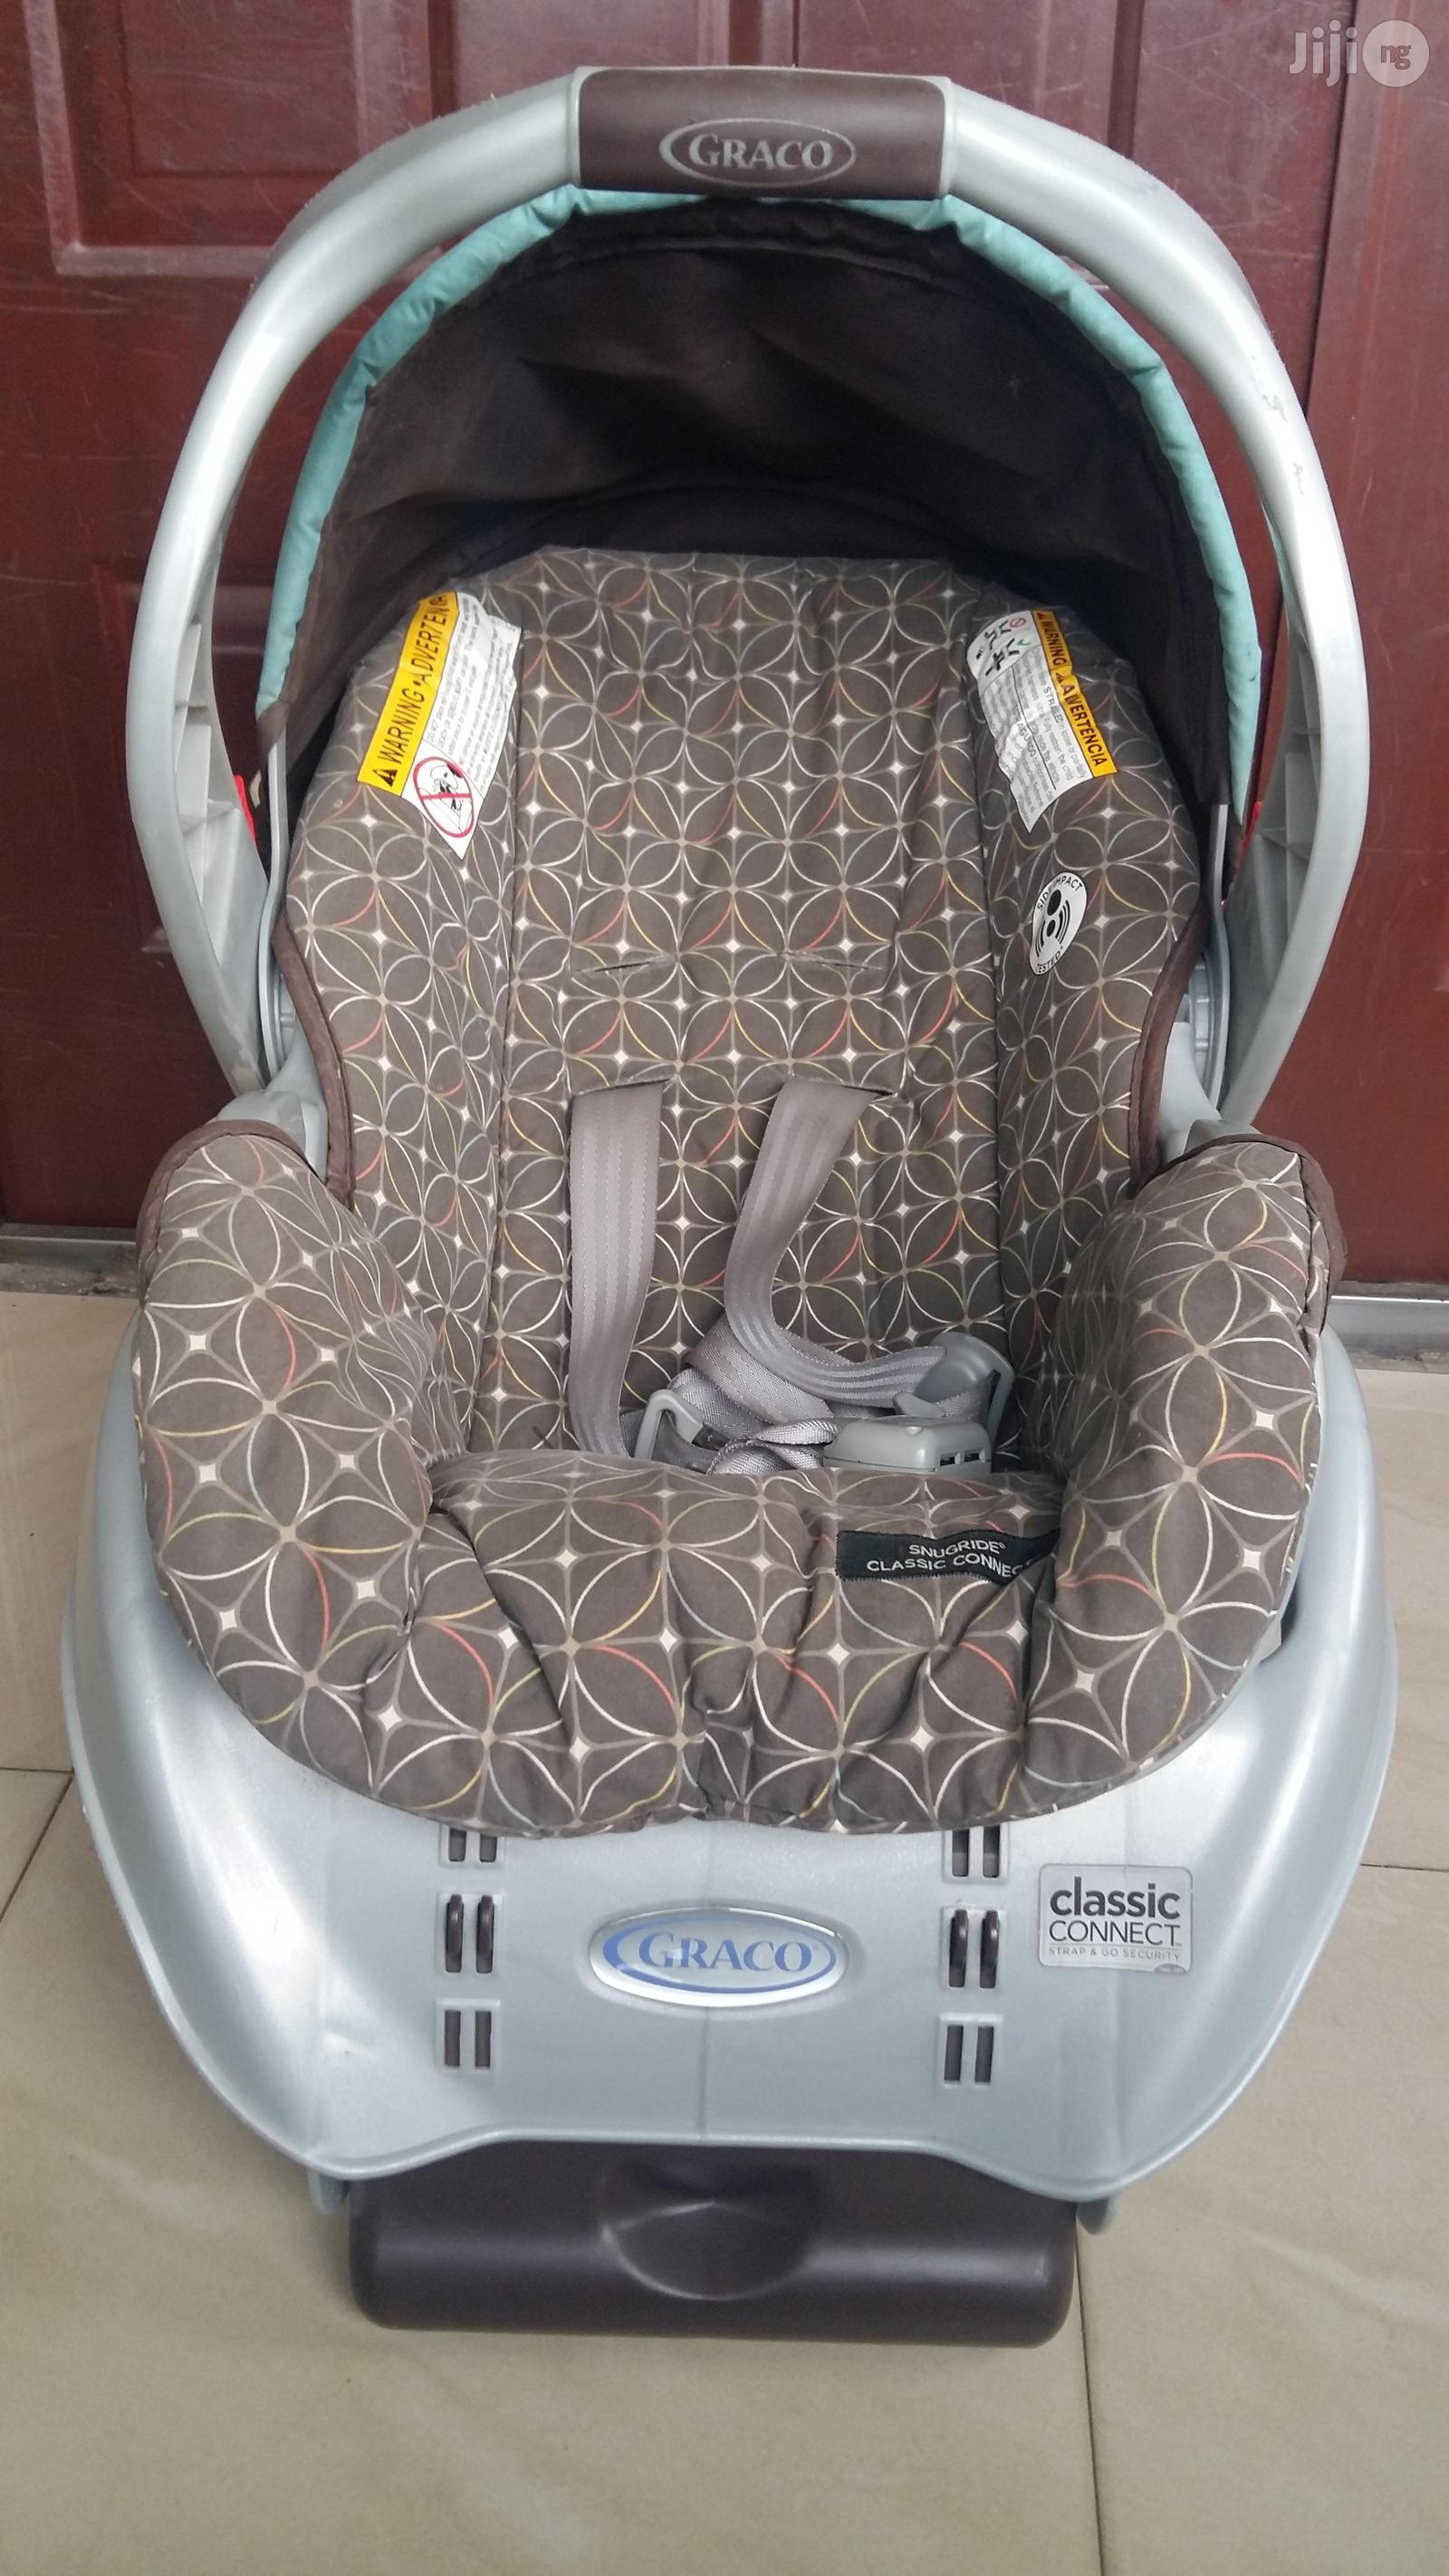 Graco Snugride Classic Connect Infant Car Seat + Stroller